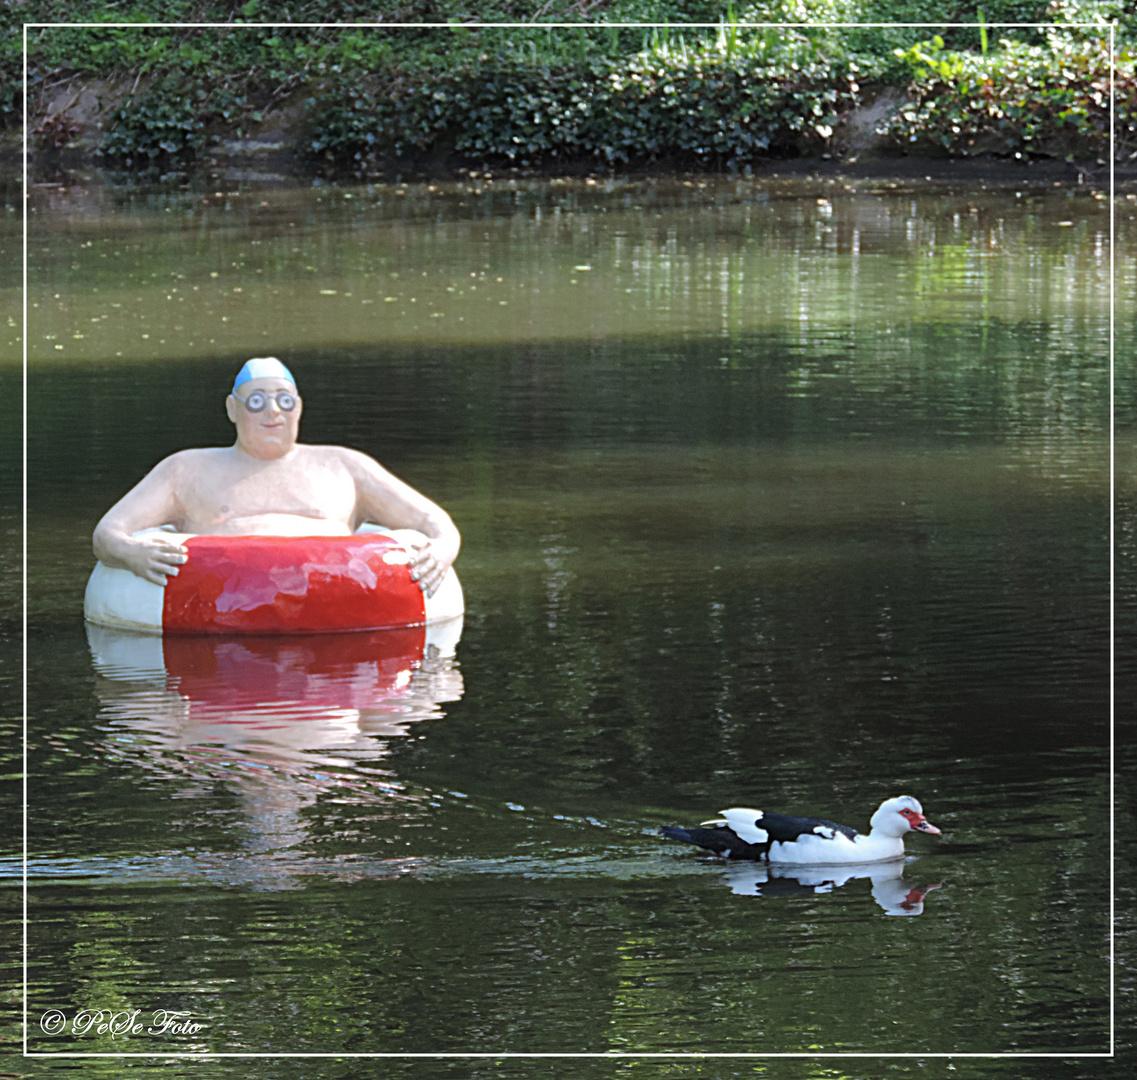 """ Pack die Badehose ein......."